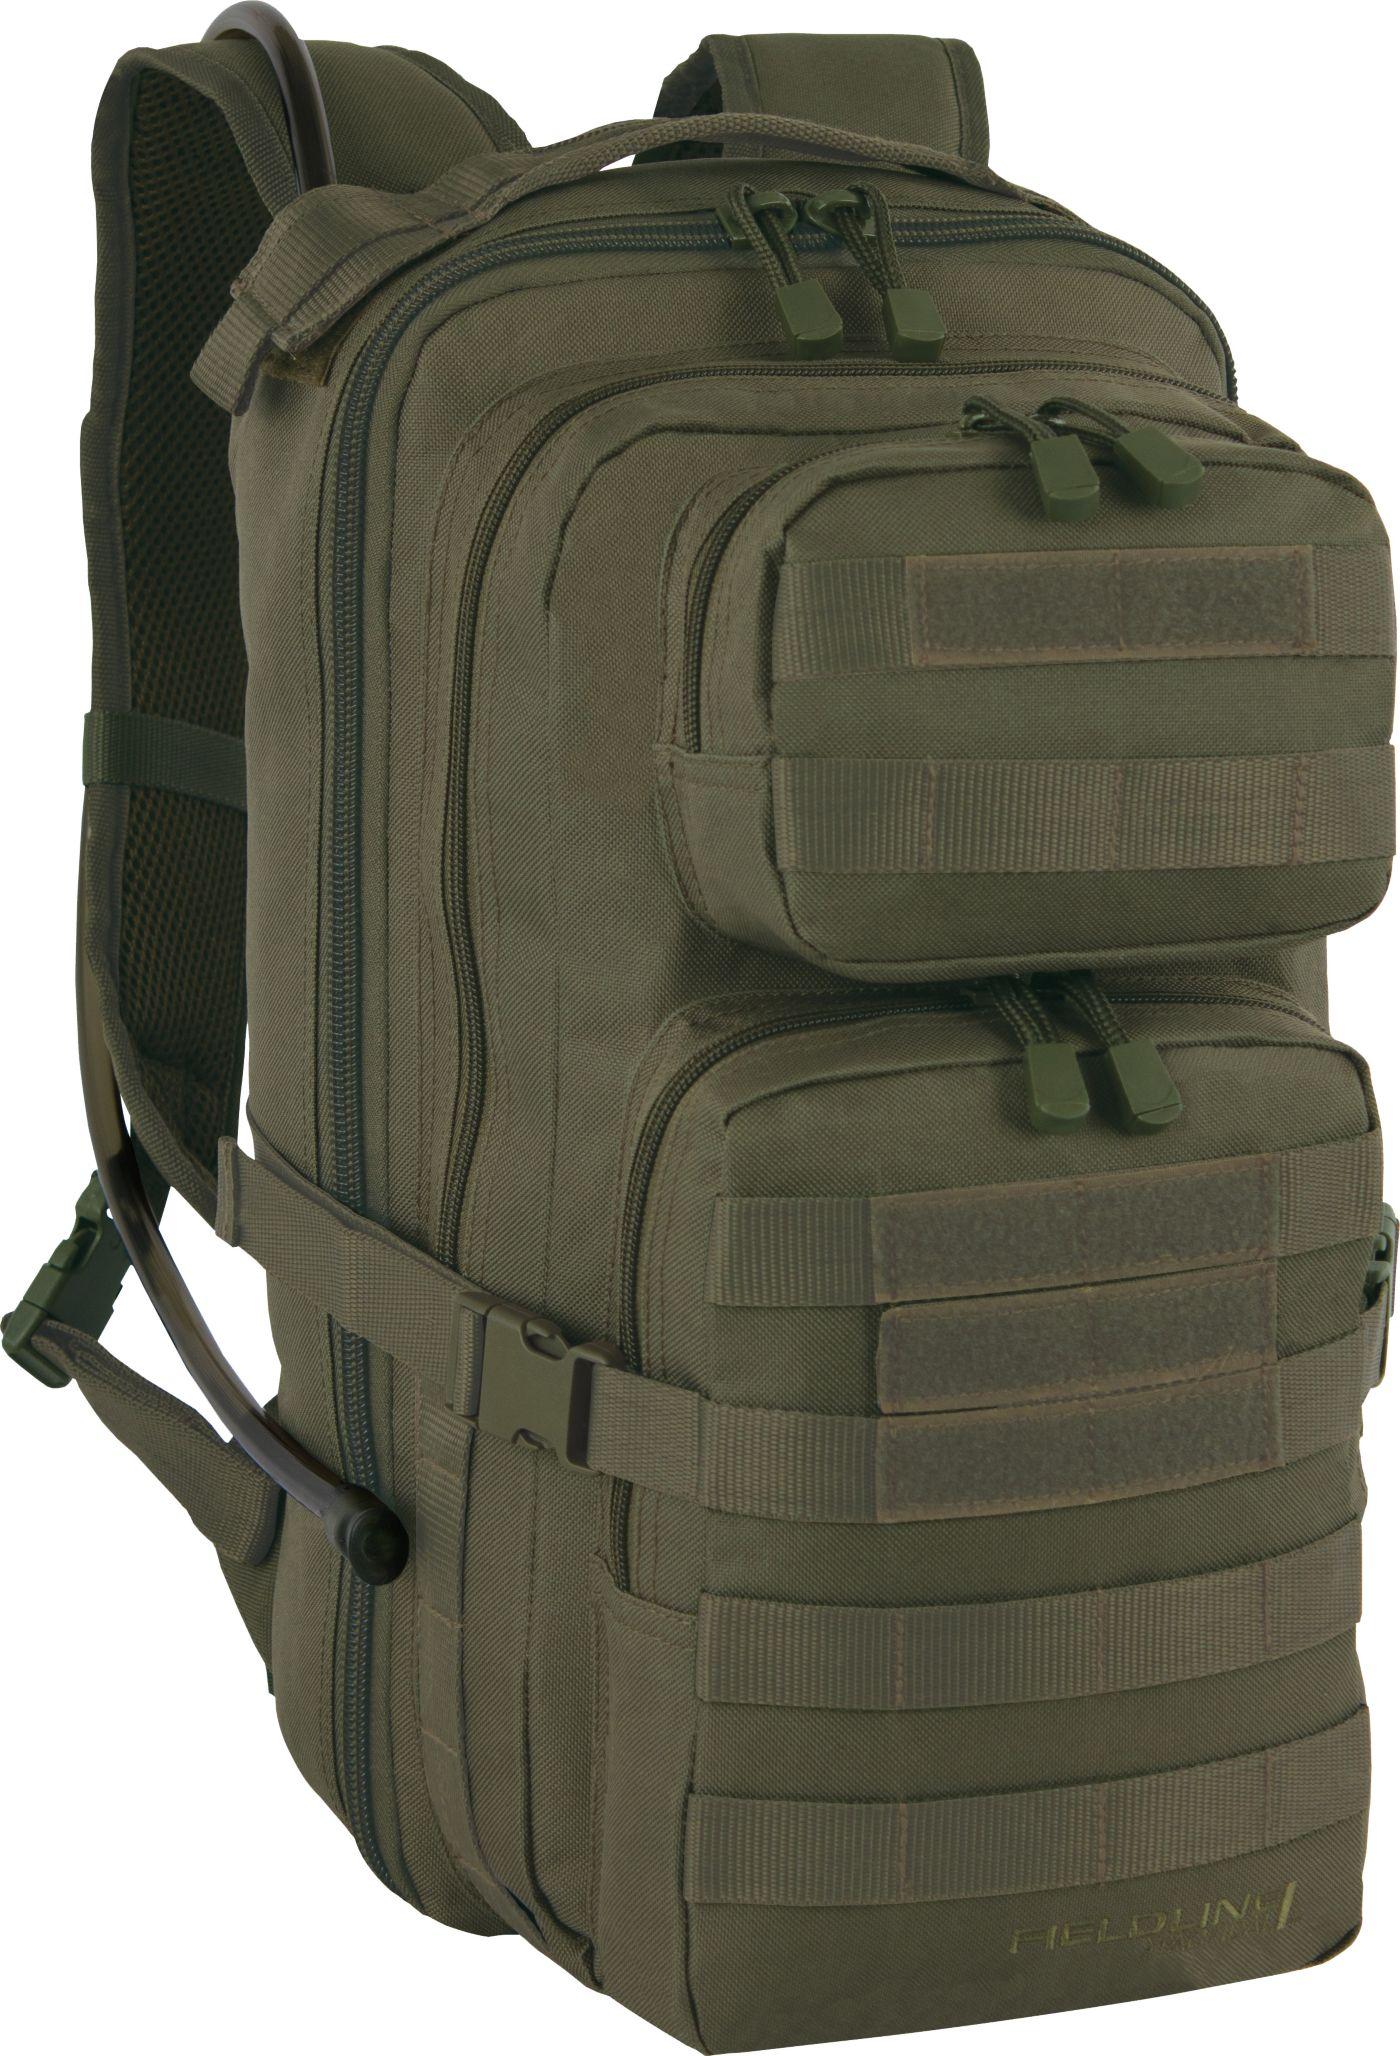 Fieldline Tactical Surge Hydration Pack